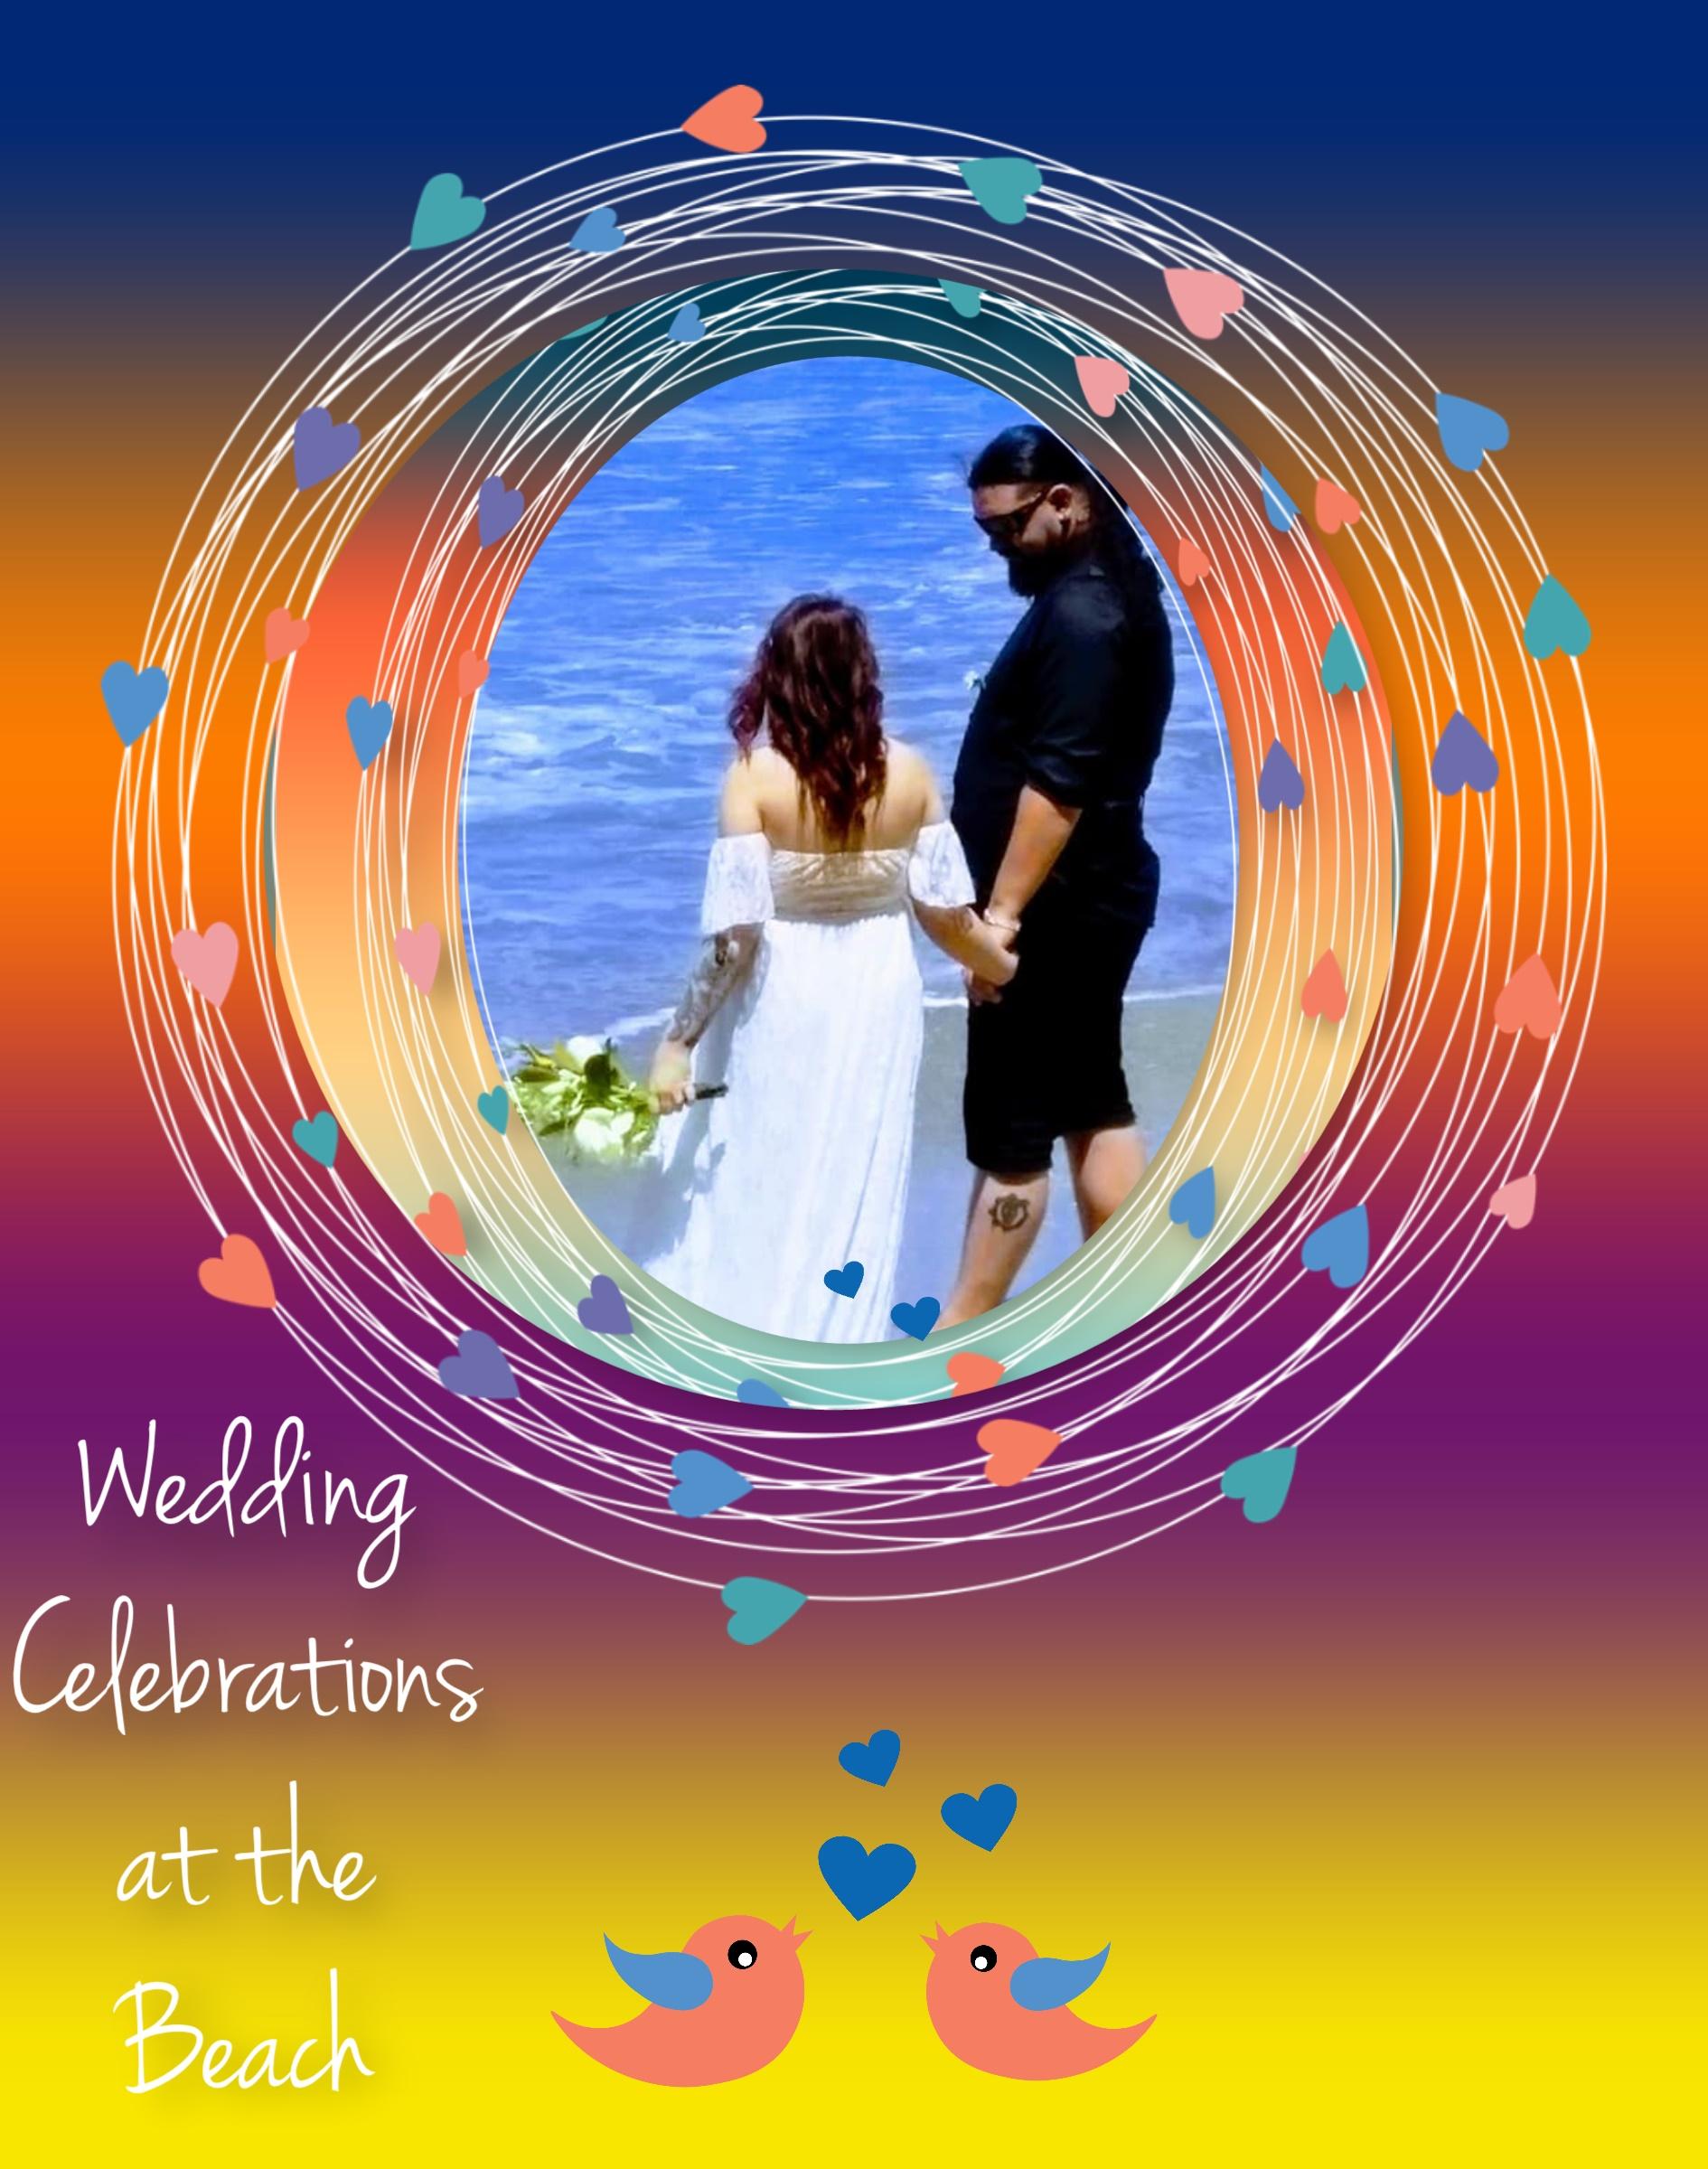 Summers Day - Beach Wedding